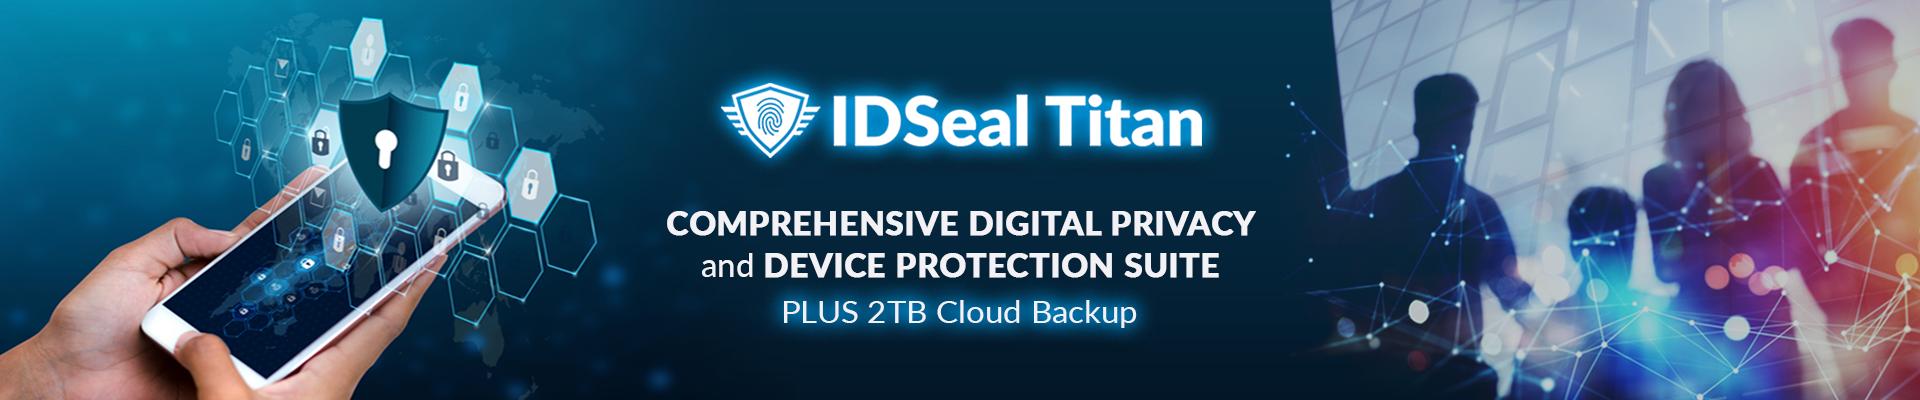 IDSeal-Titan-Digital-Privacy